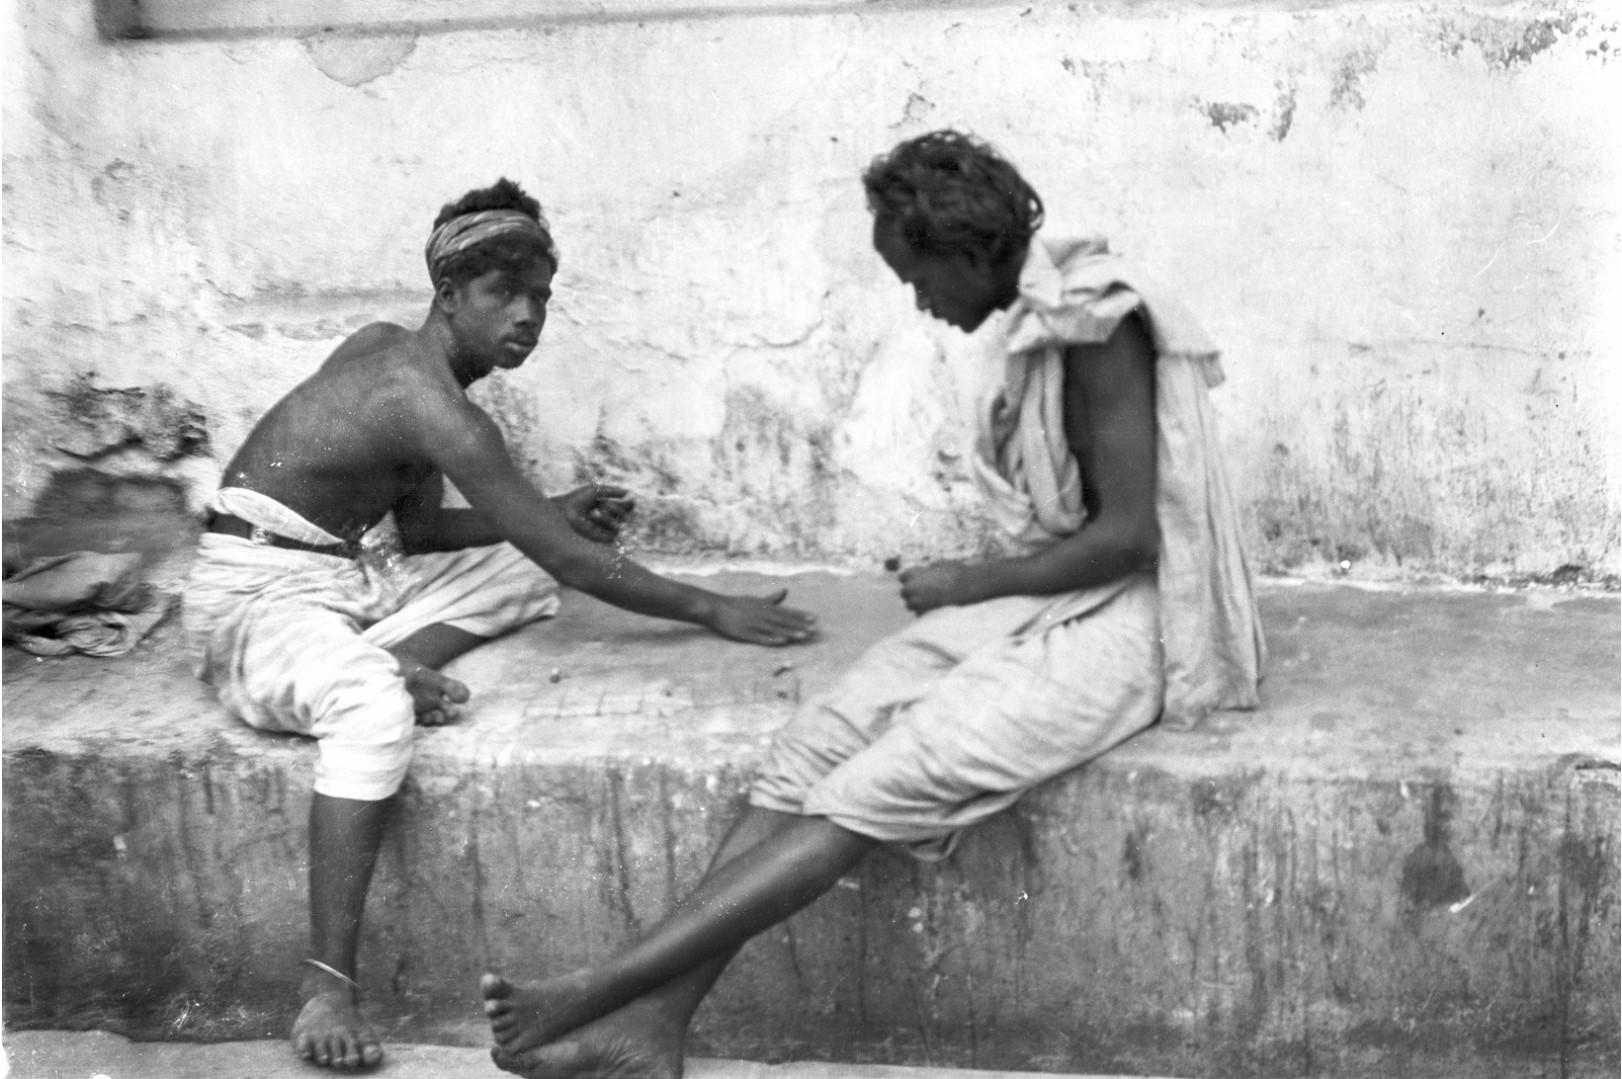 229. Два тамила играют в азартную игру на базаре Канди